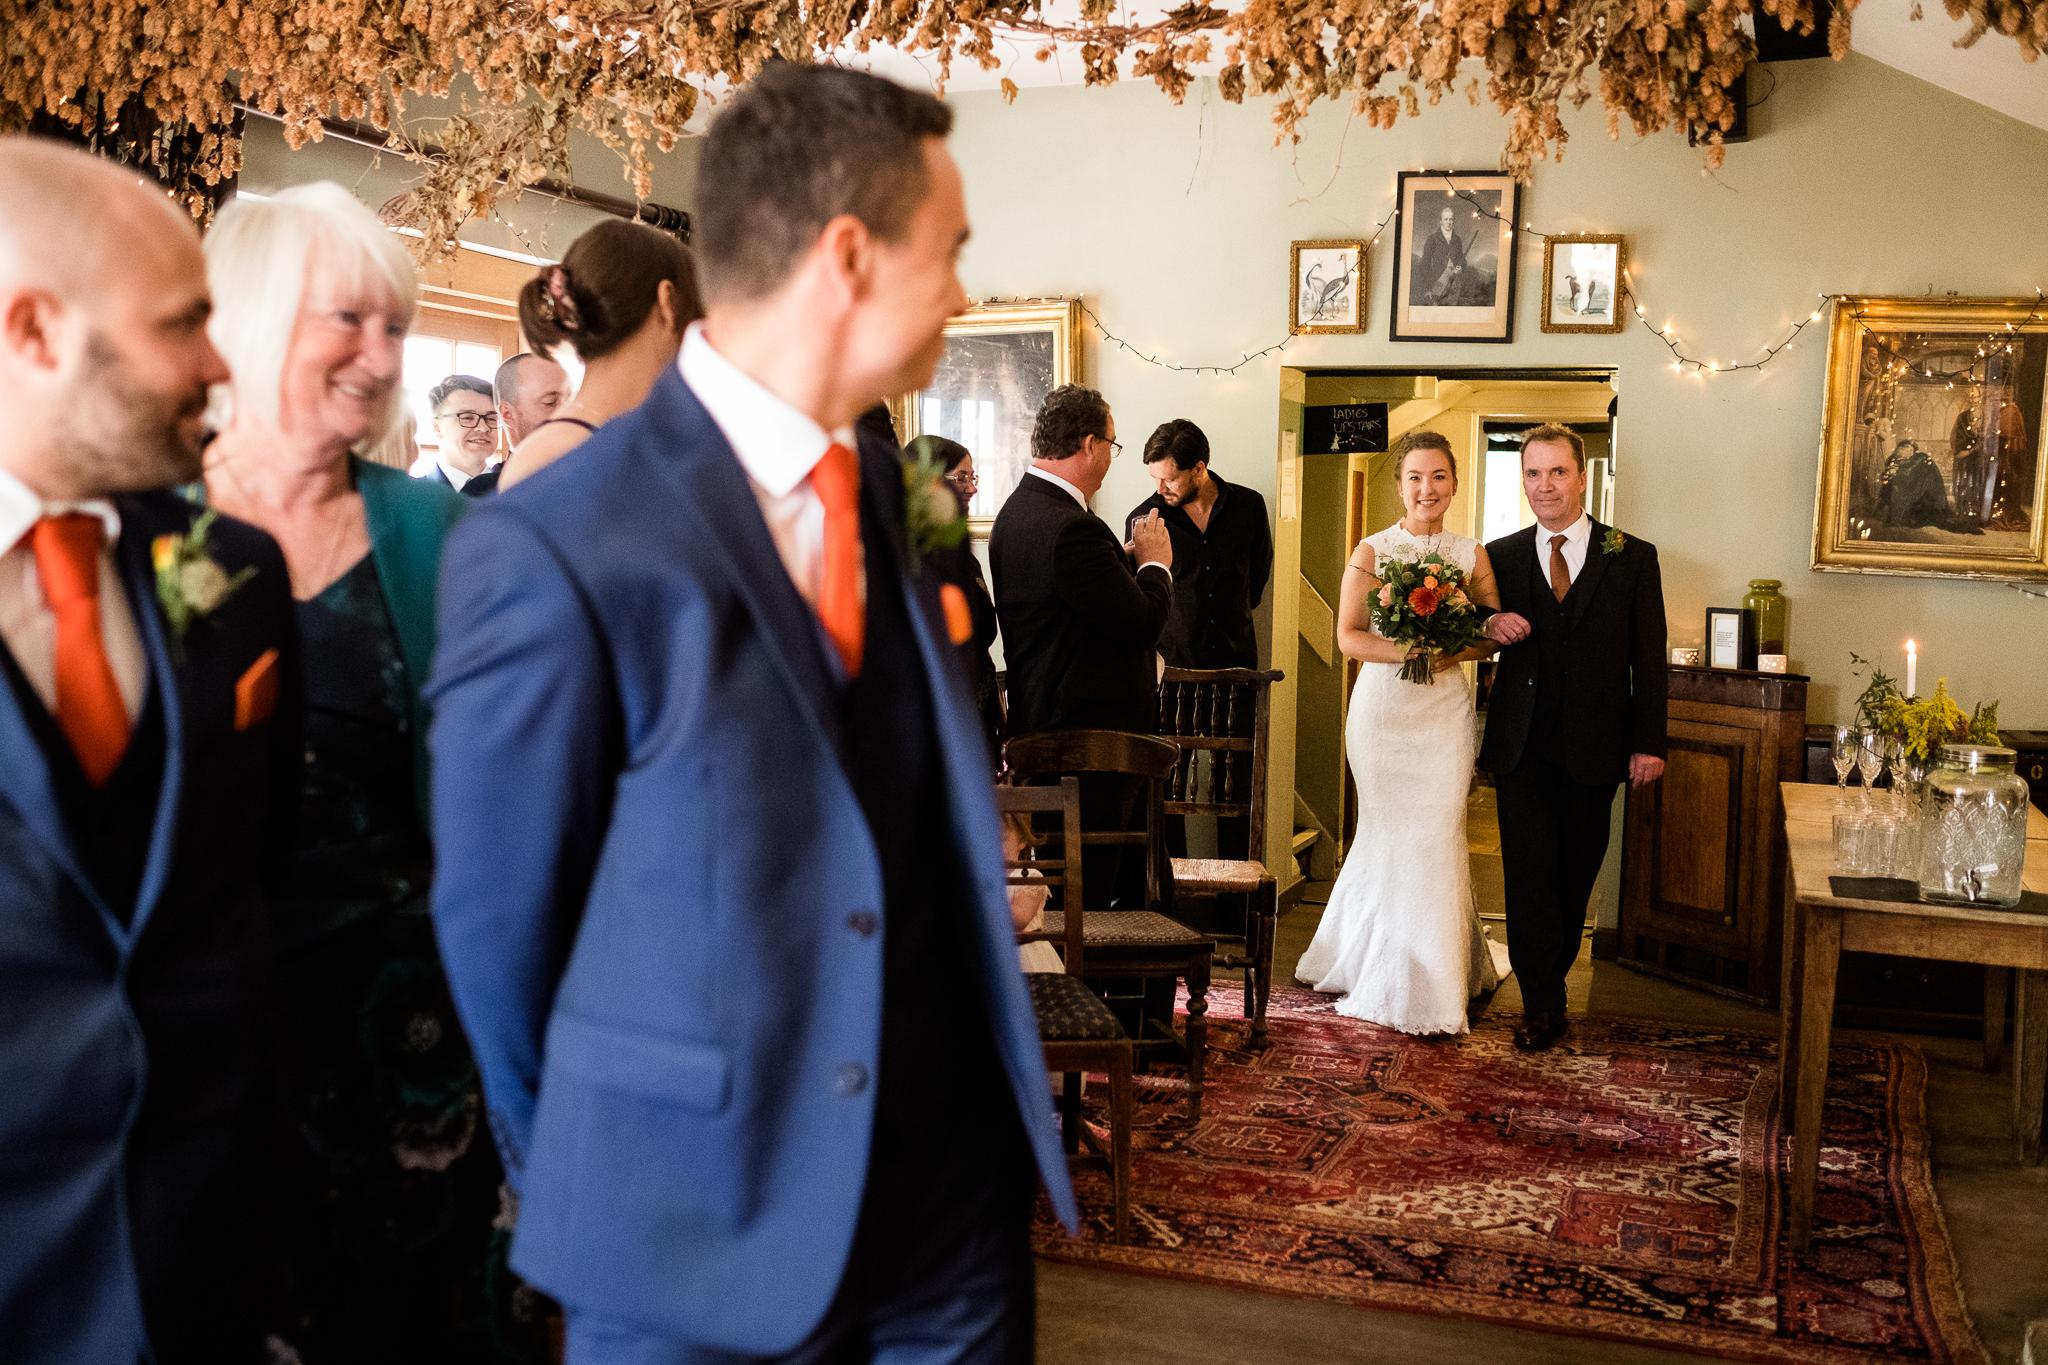 Relaxed Documentary Wedding Photography at The Wizard Inn, Alderley Edge Cheshire - Jenny Harper-20.jpg